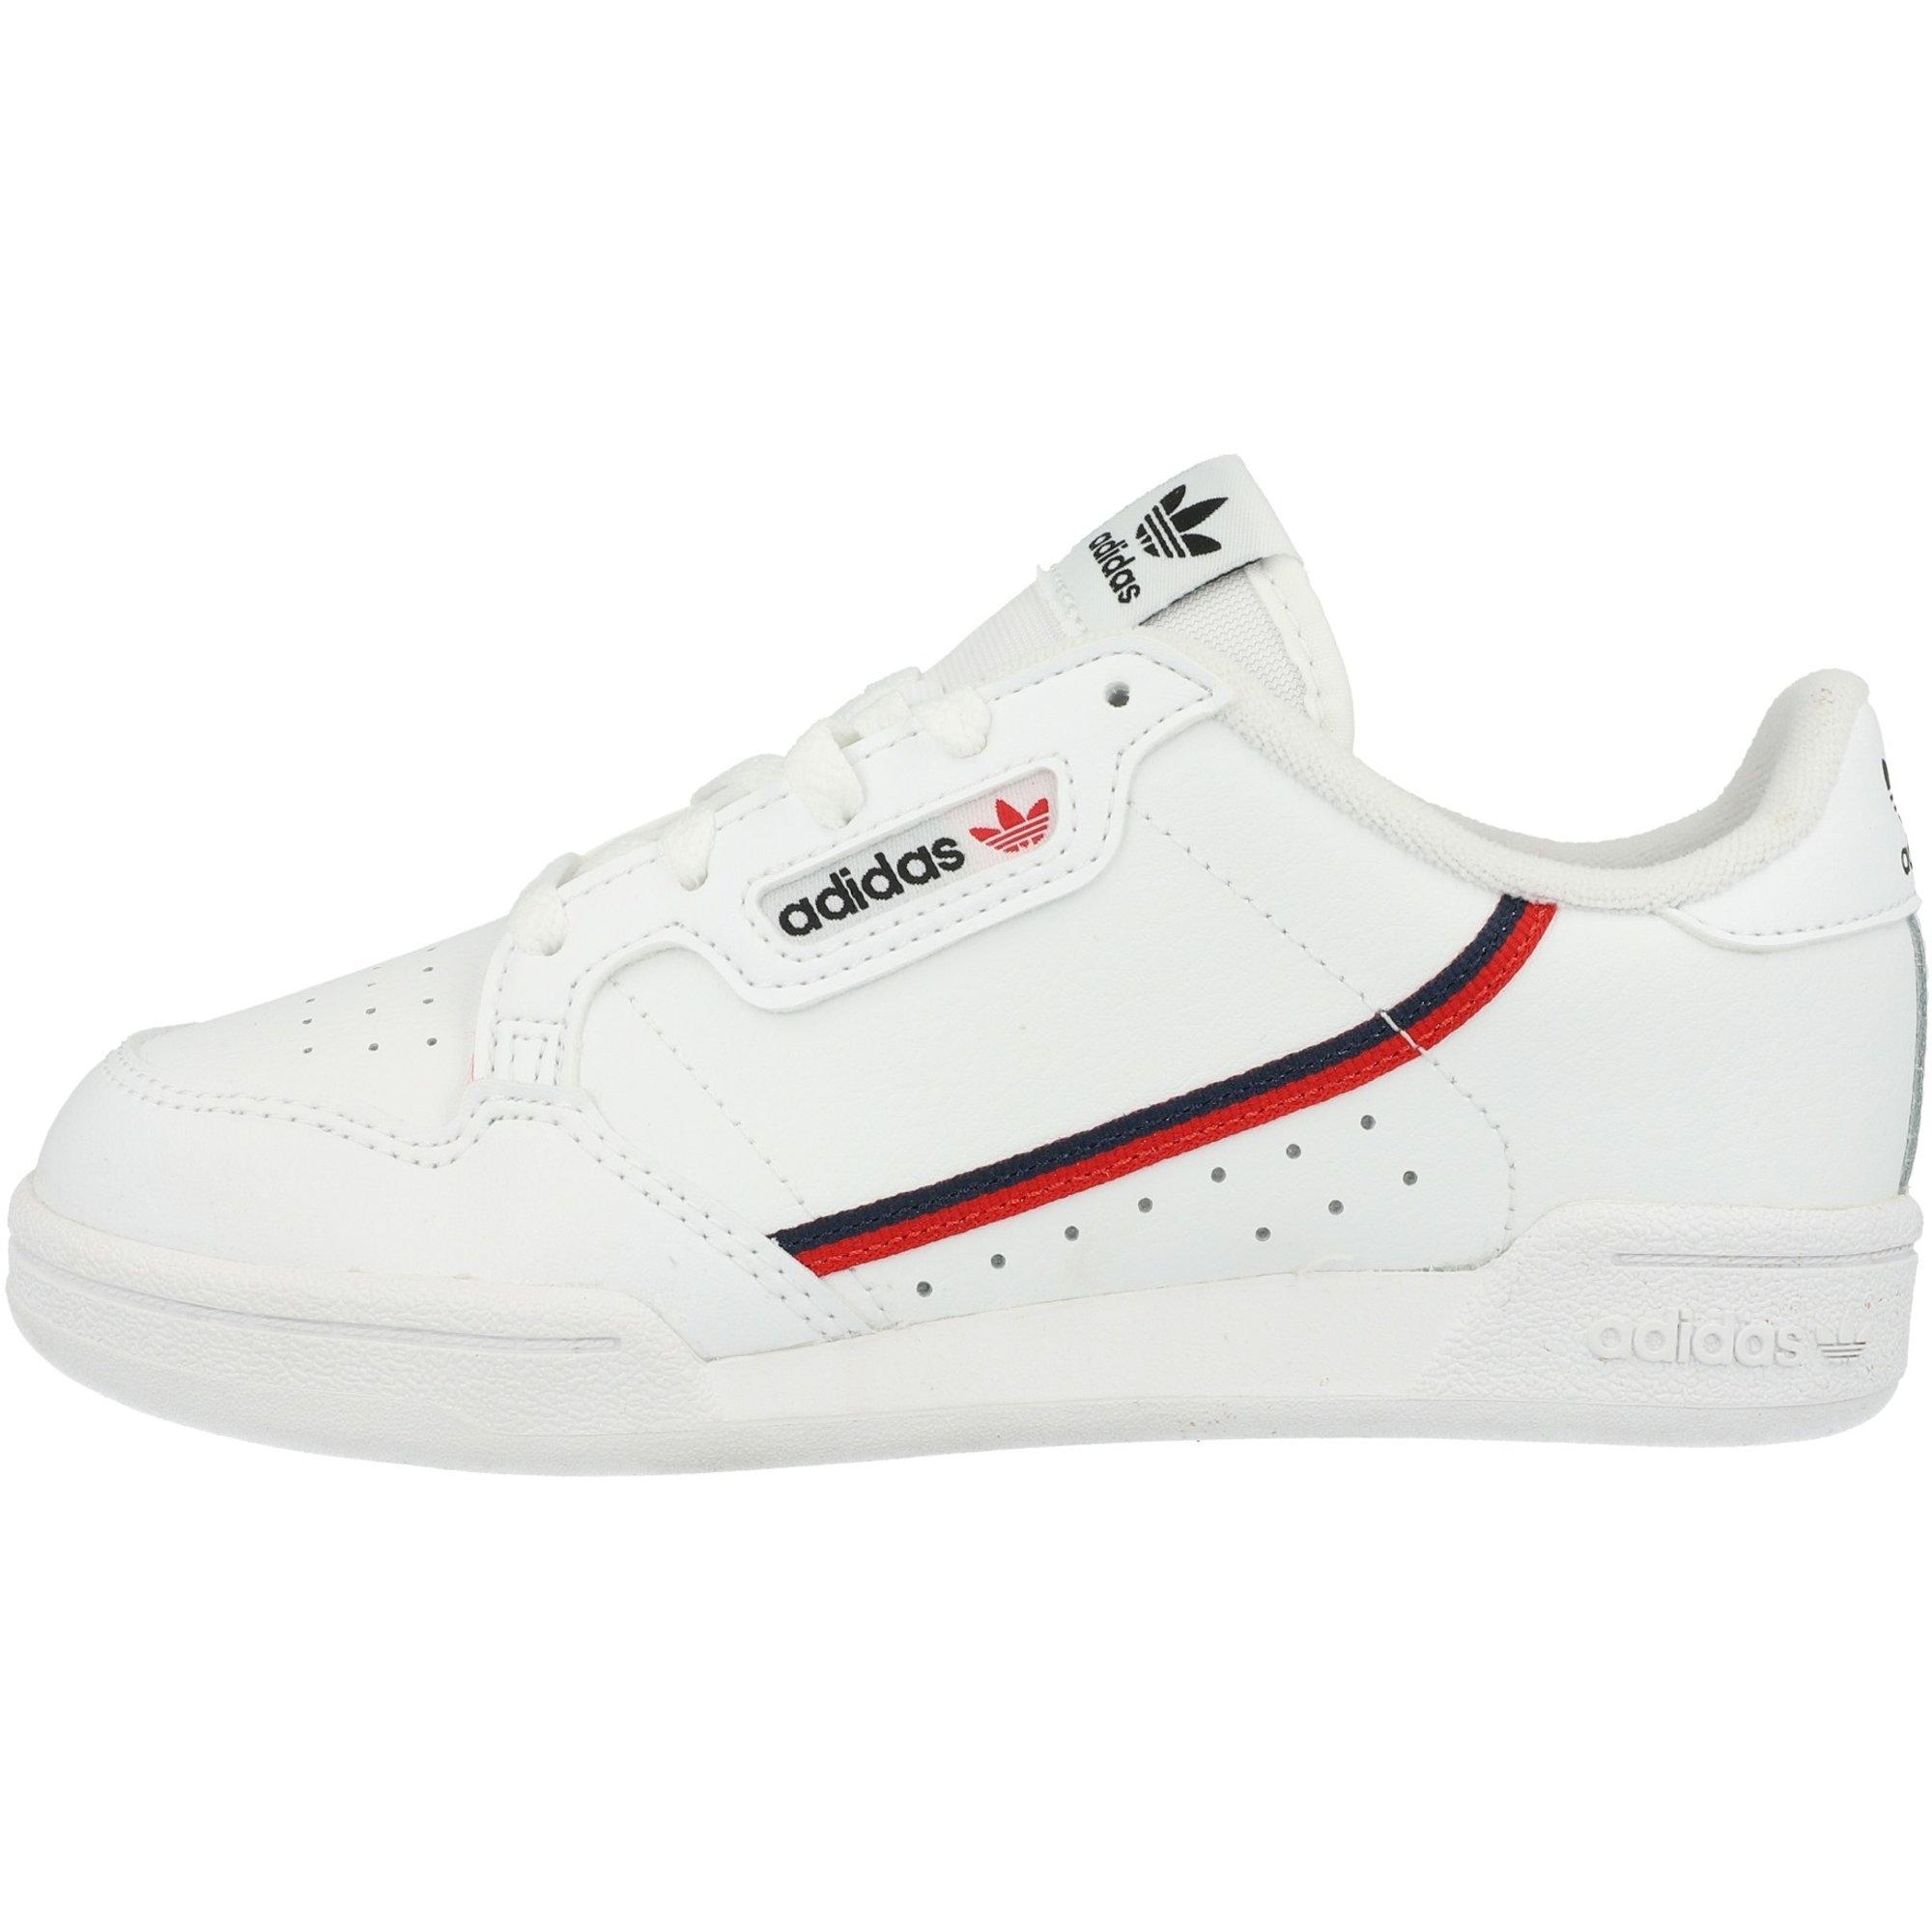 adidas bianca sneakers singapore